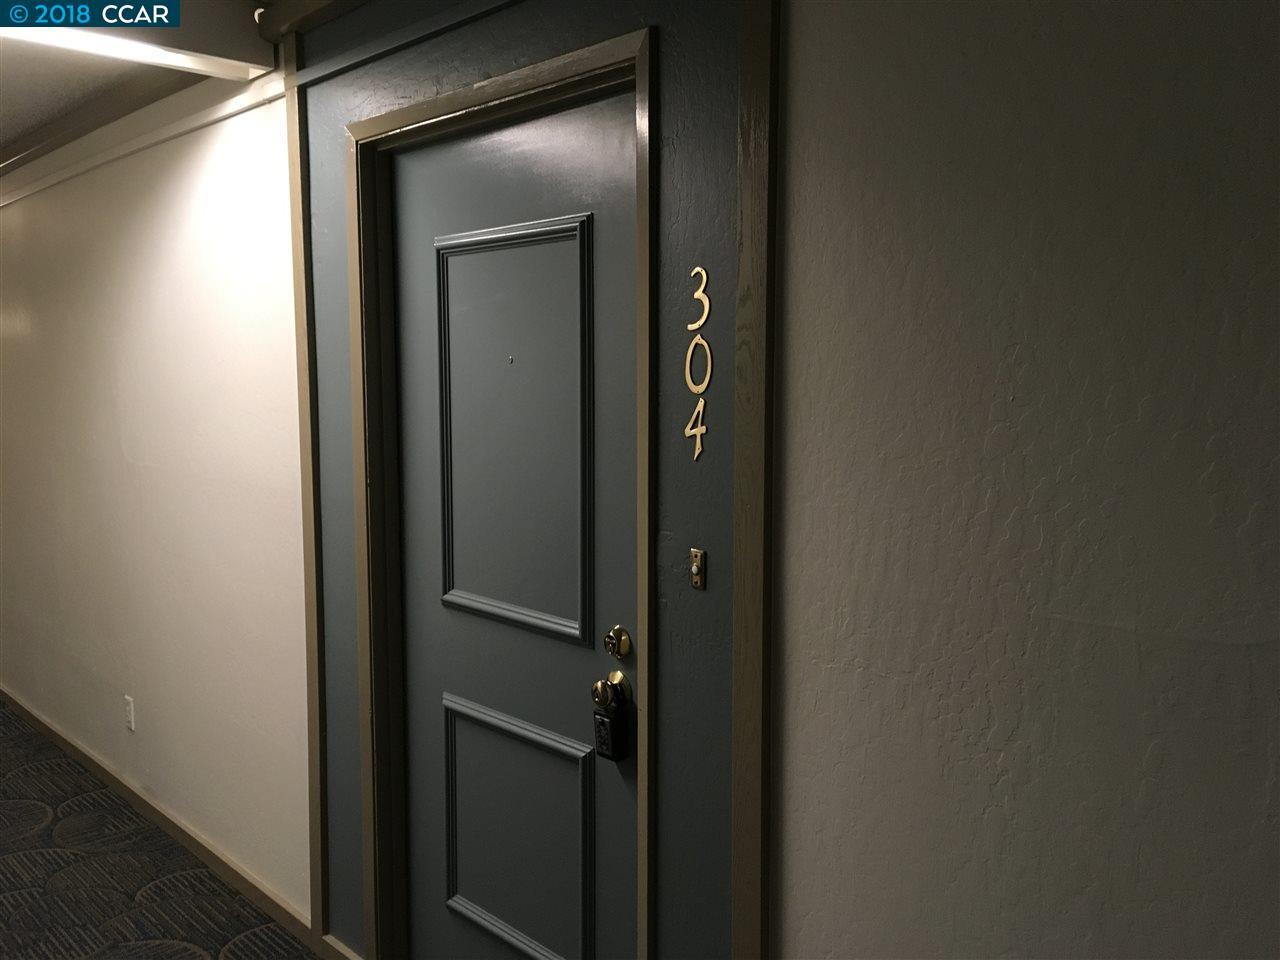 Condominium for Sale at 460 N Civic 460 N Civic Walnut Creek, California 94596 United States